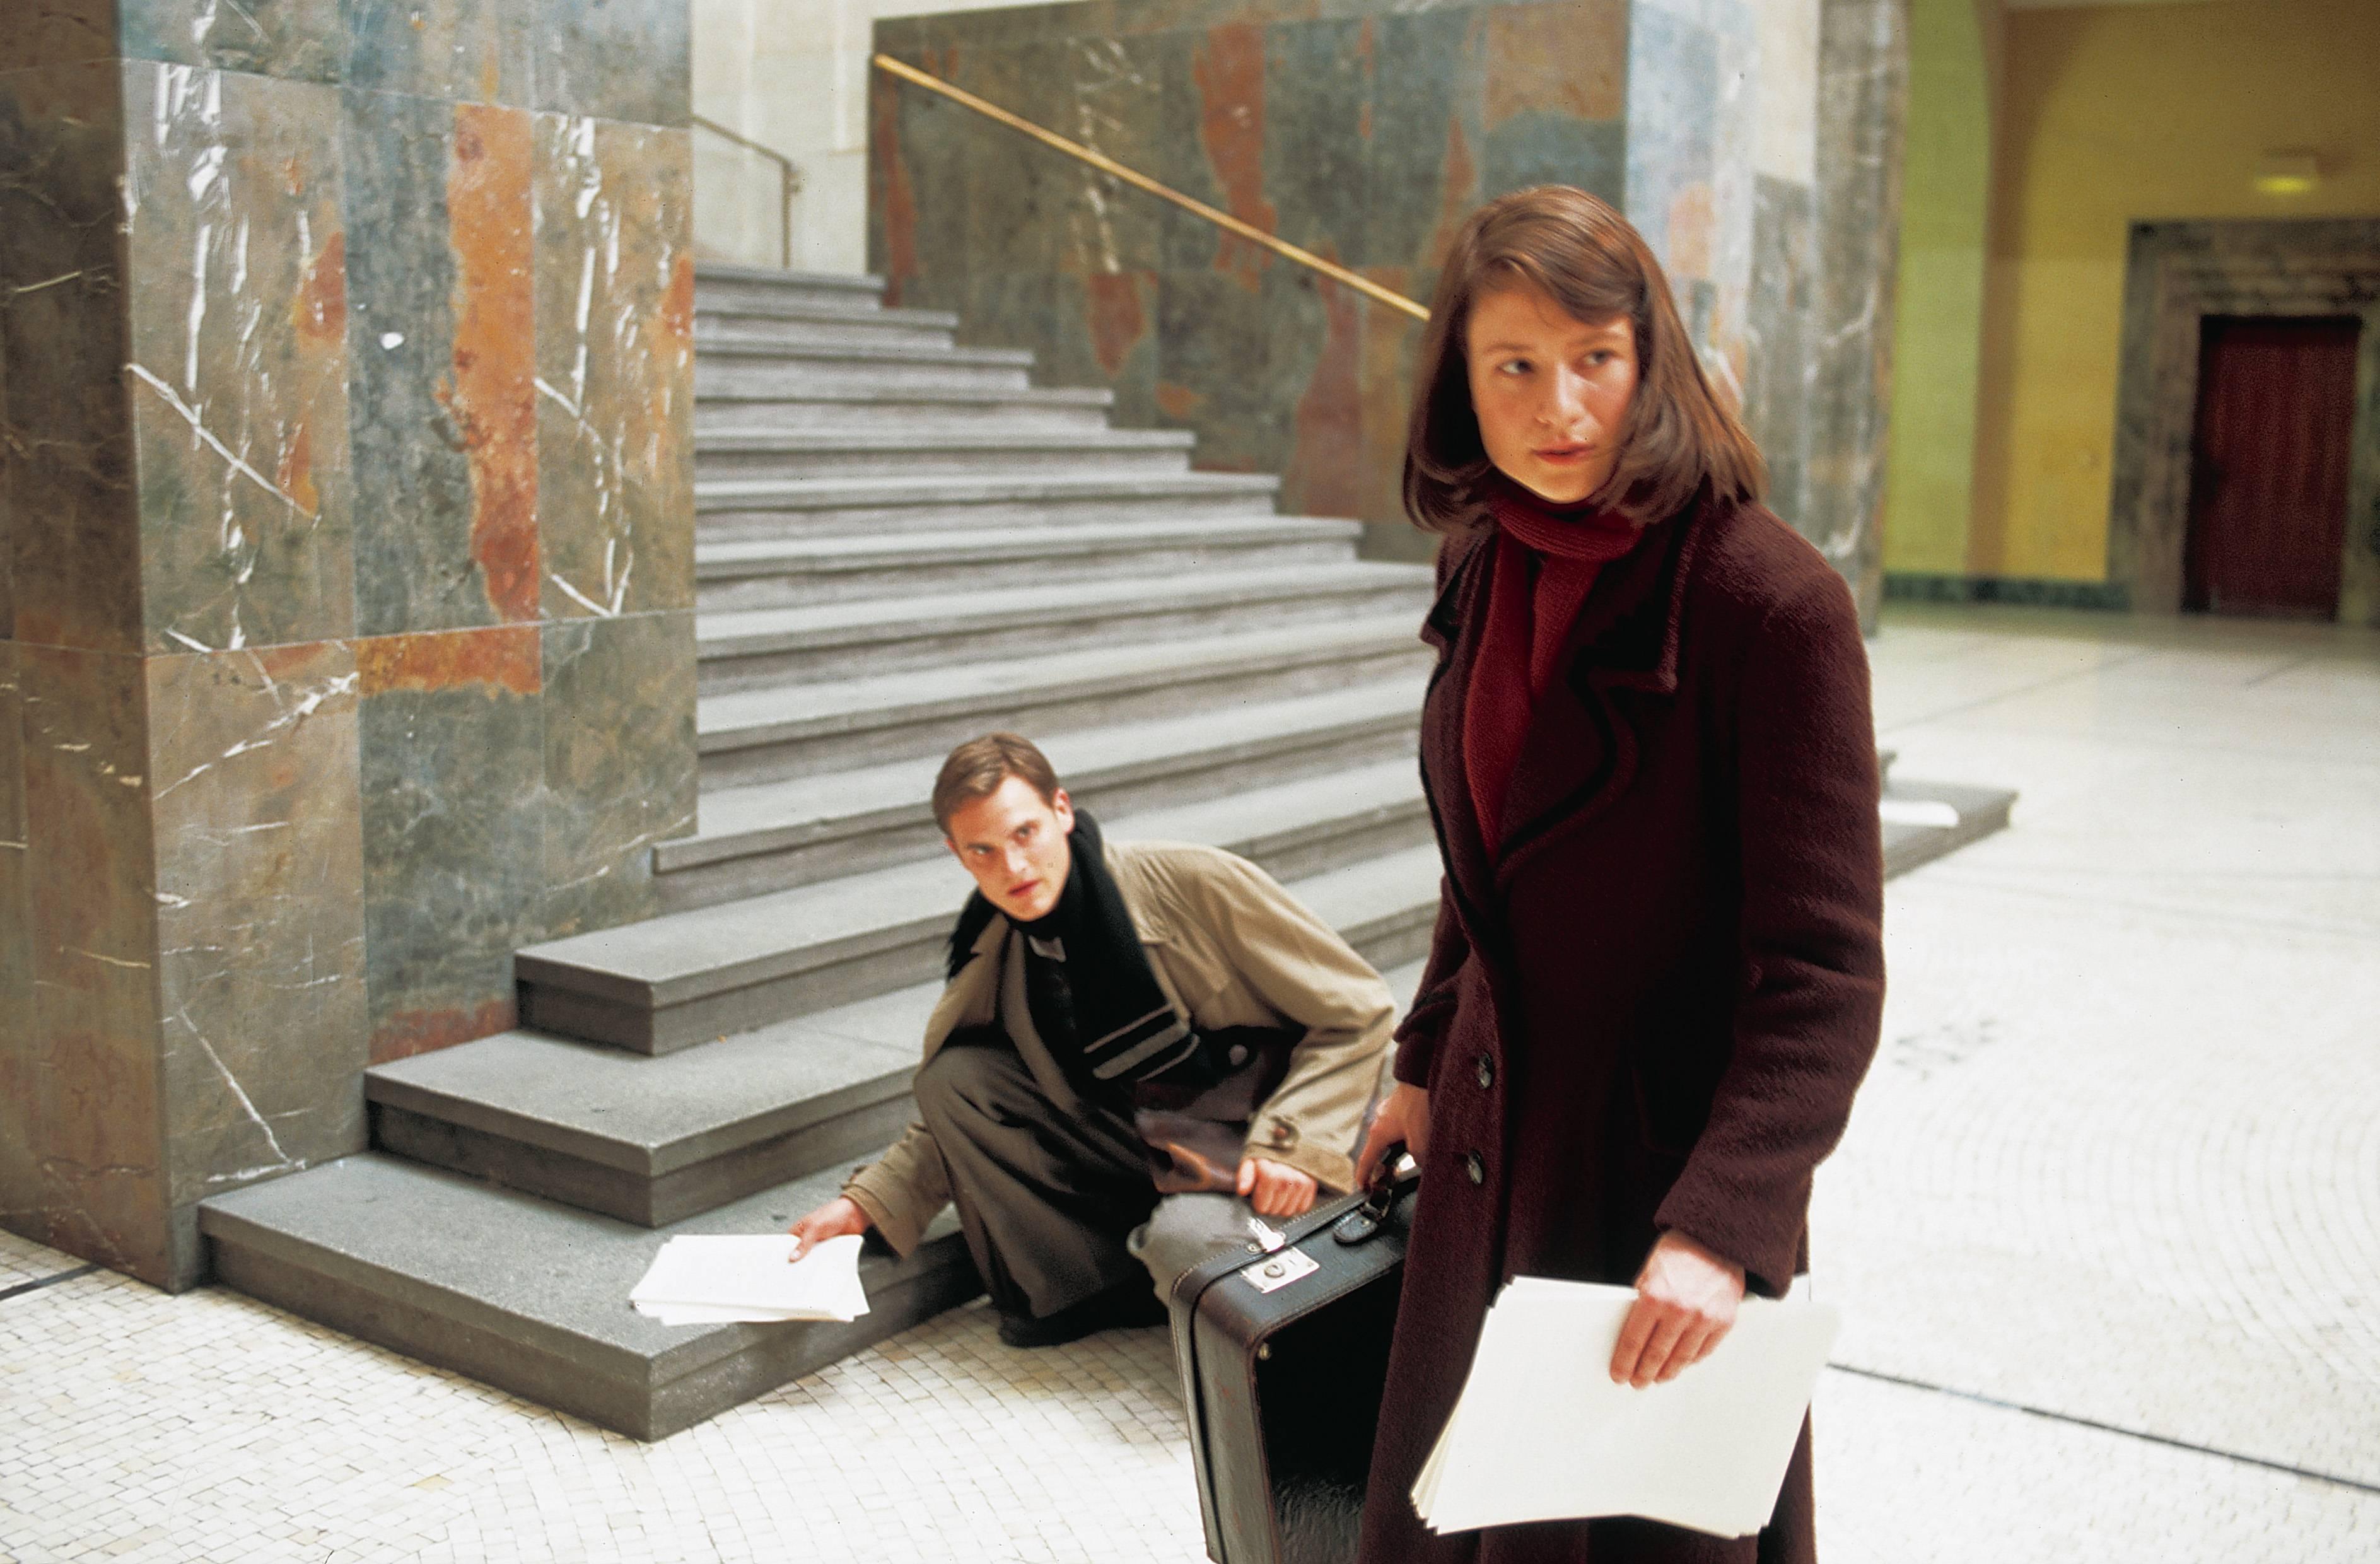 Sophie Scholl: The Last Days